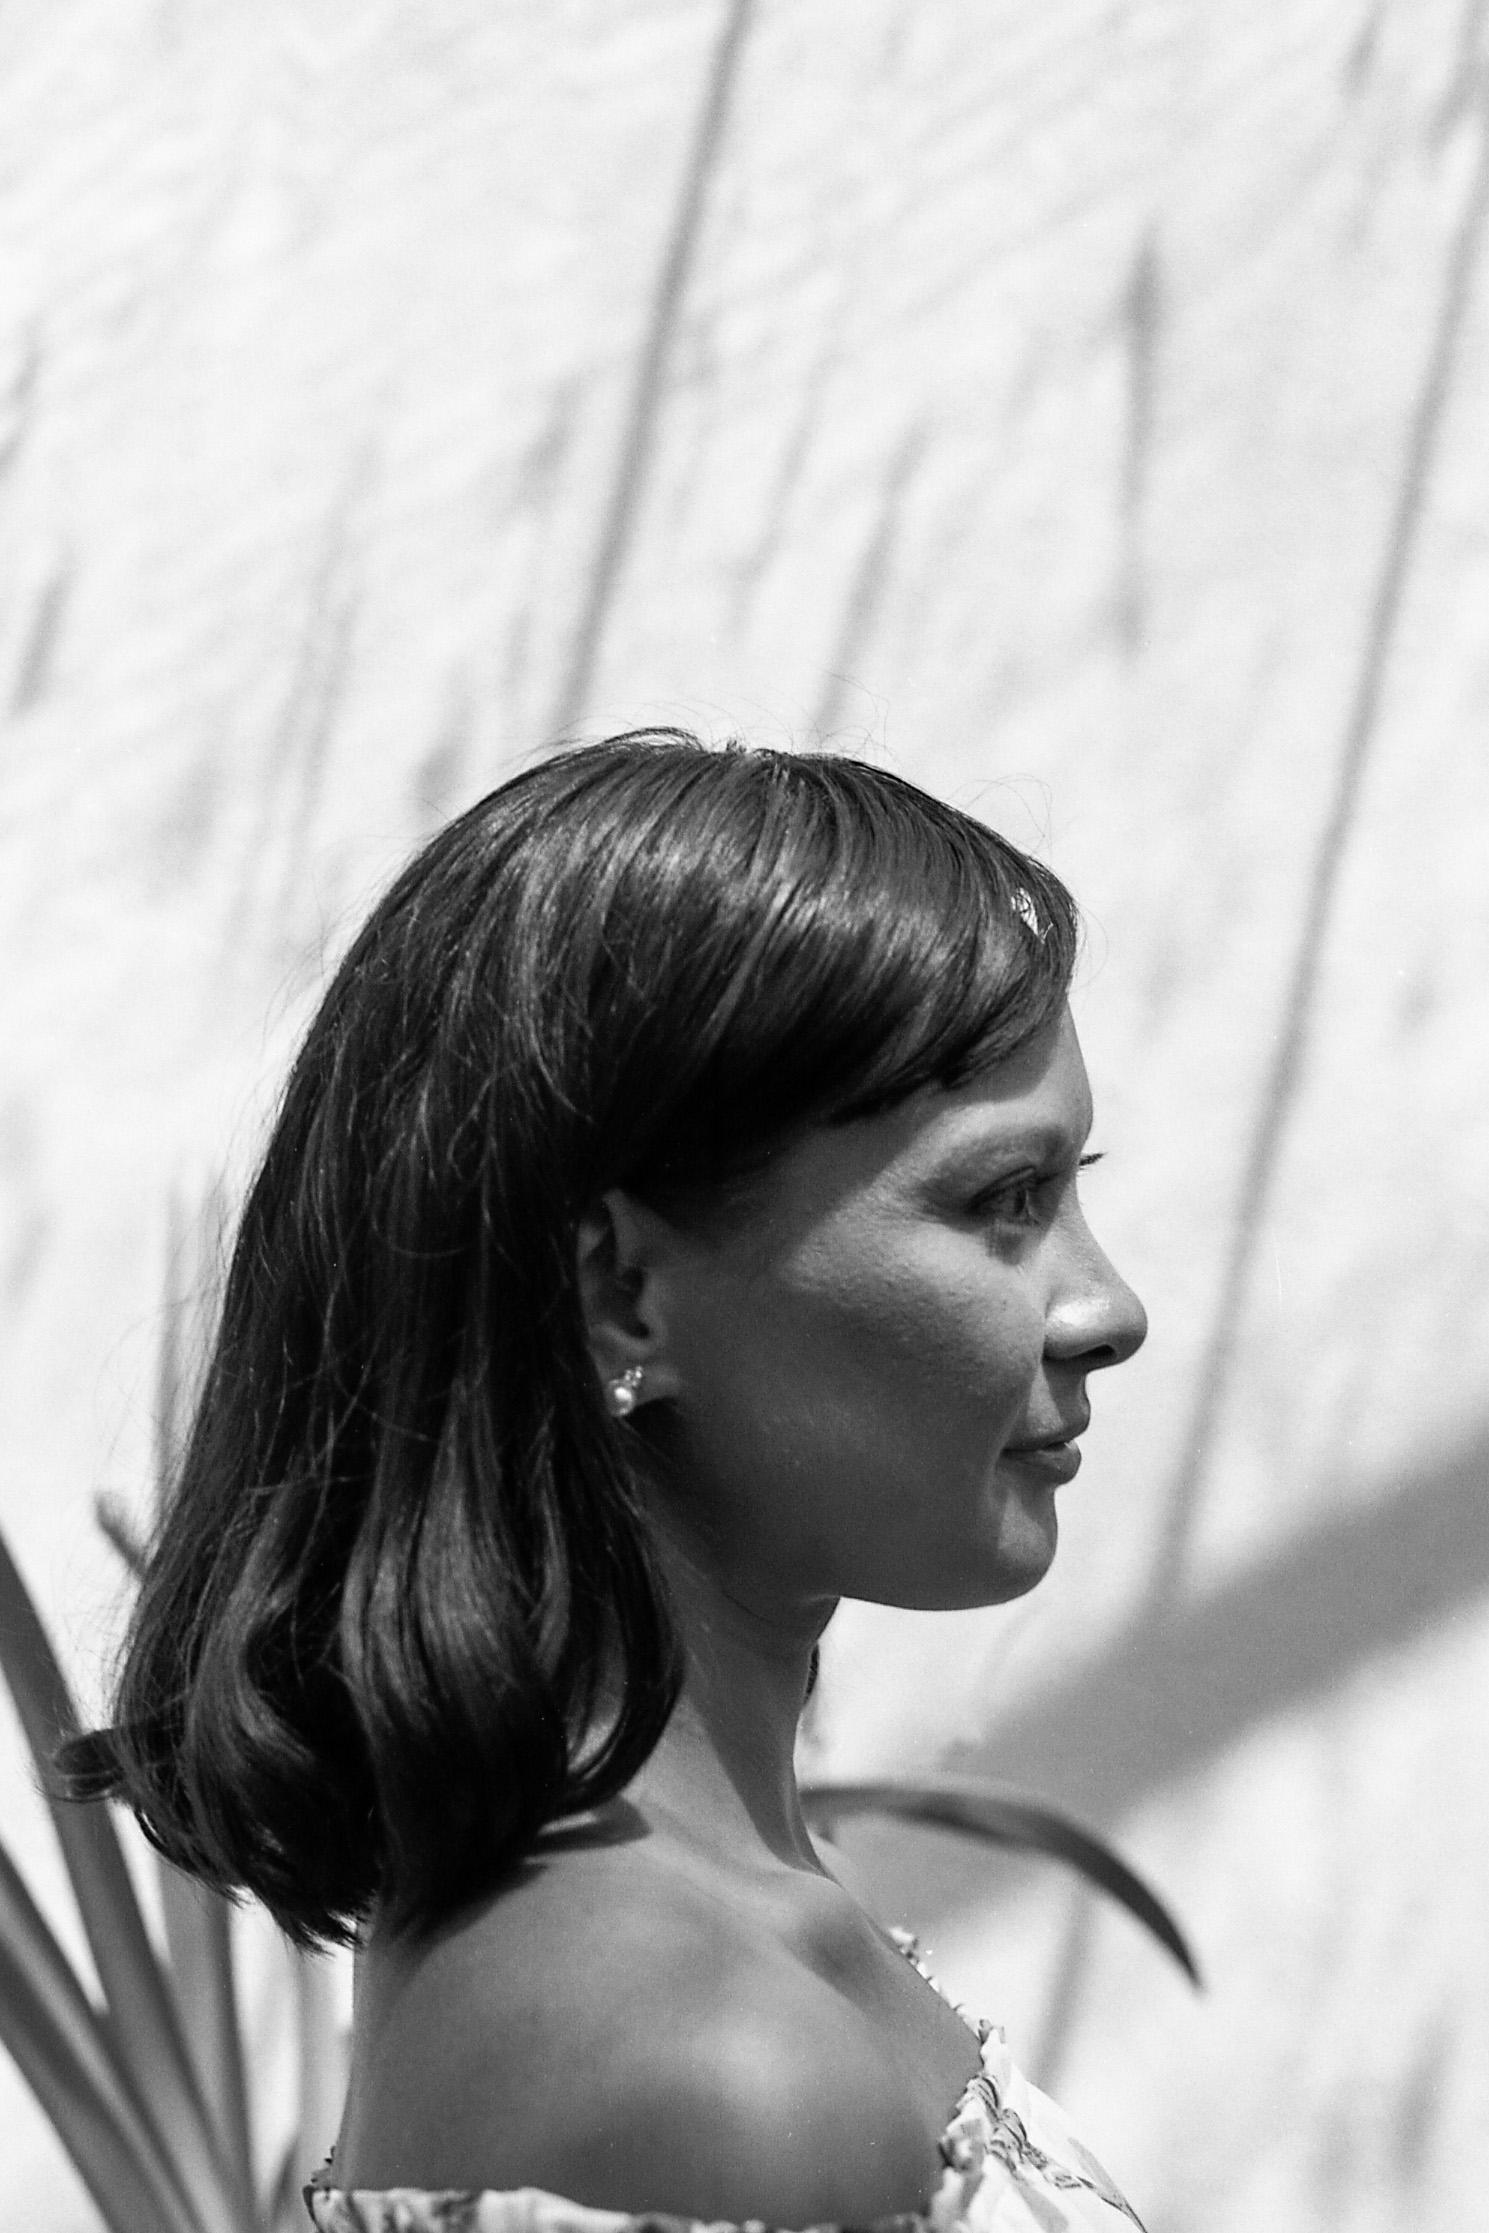 072719-photo-shoot-Marianna-Dlugosz-FIlm-Portrait-07.jpg